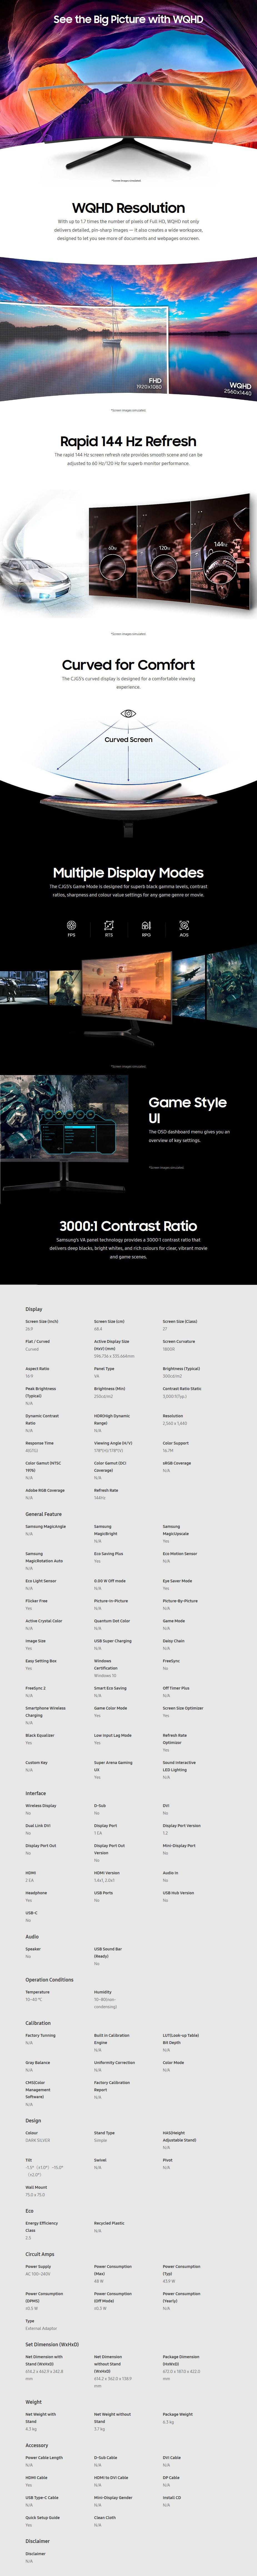 "Samsung CJG5 27"" 144Hz WQHD VA Curved Gaming Monitor - Desktop Overview 1"